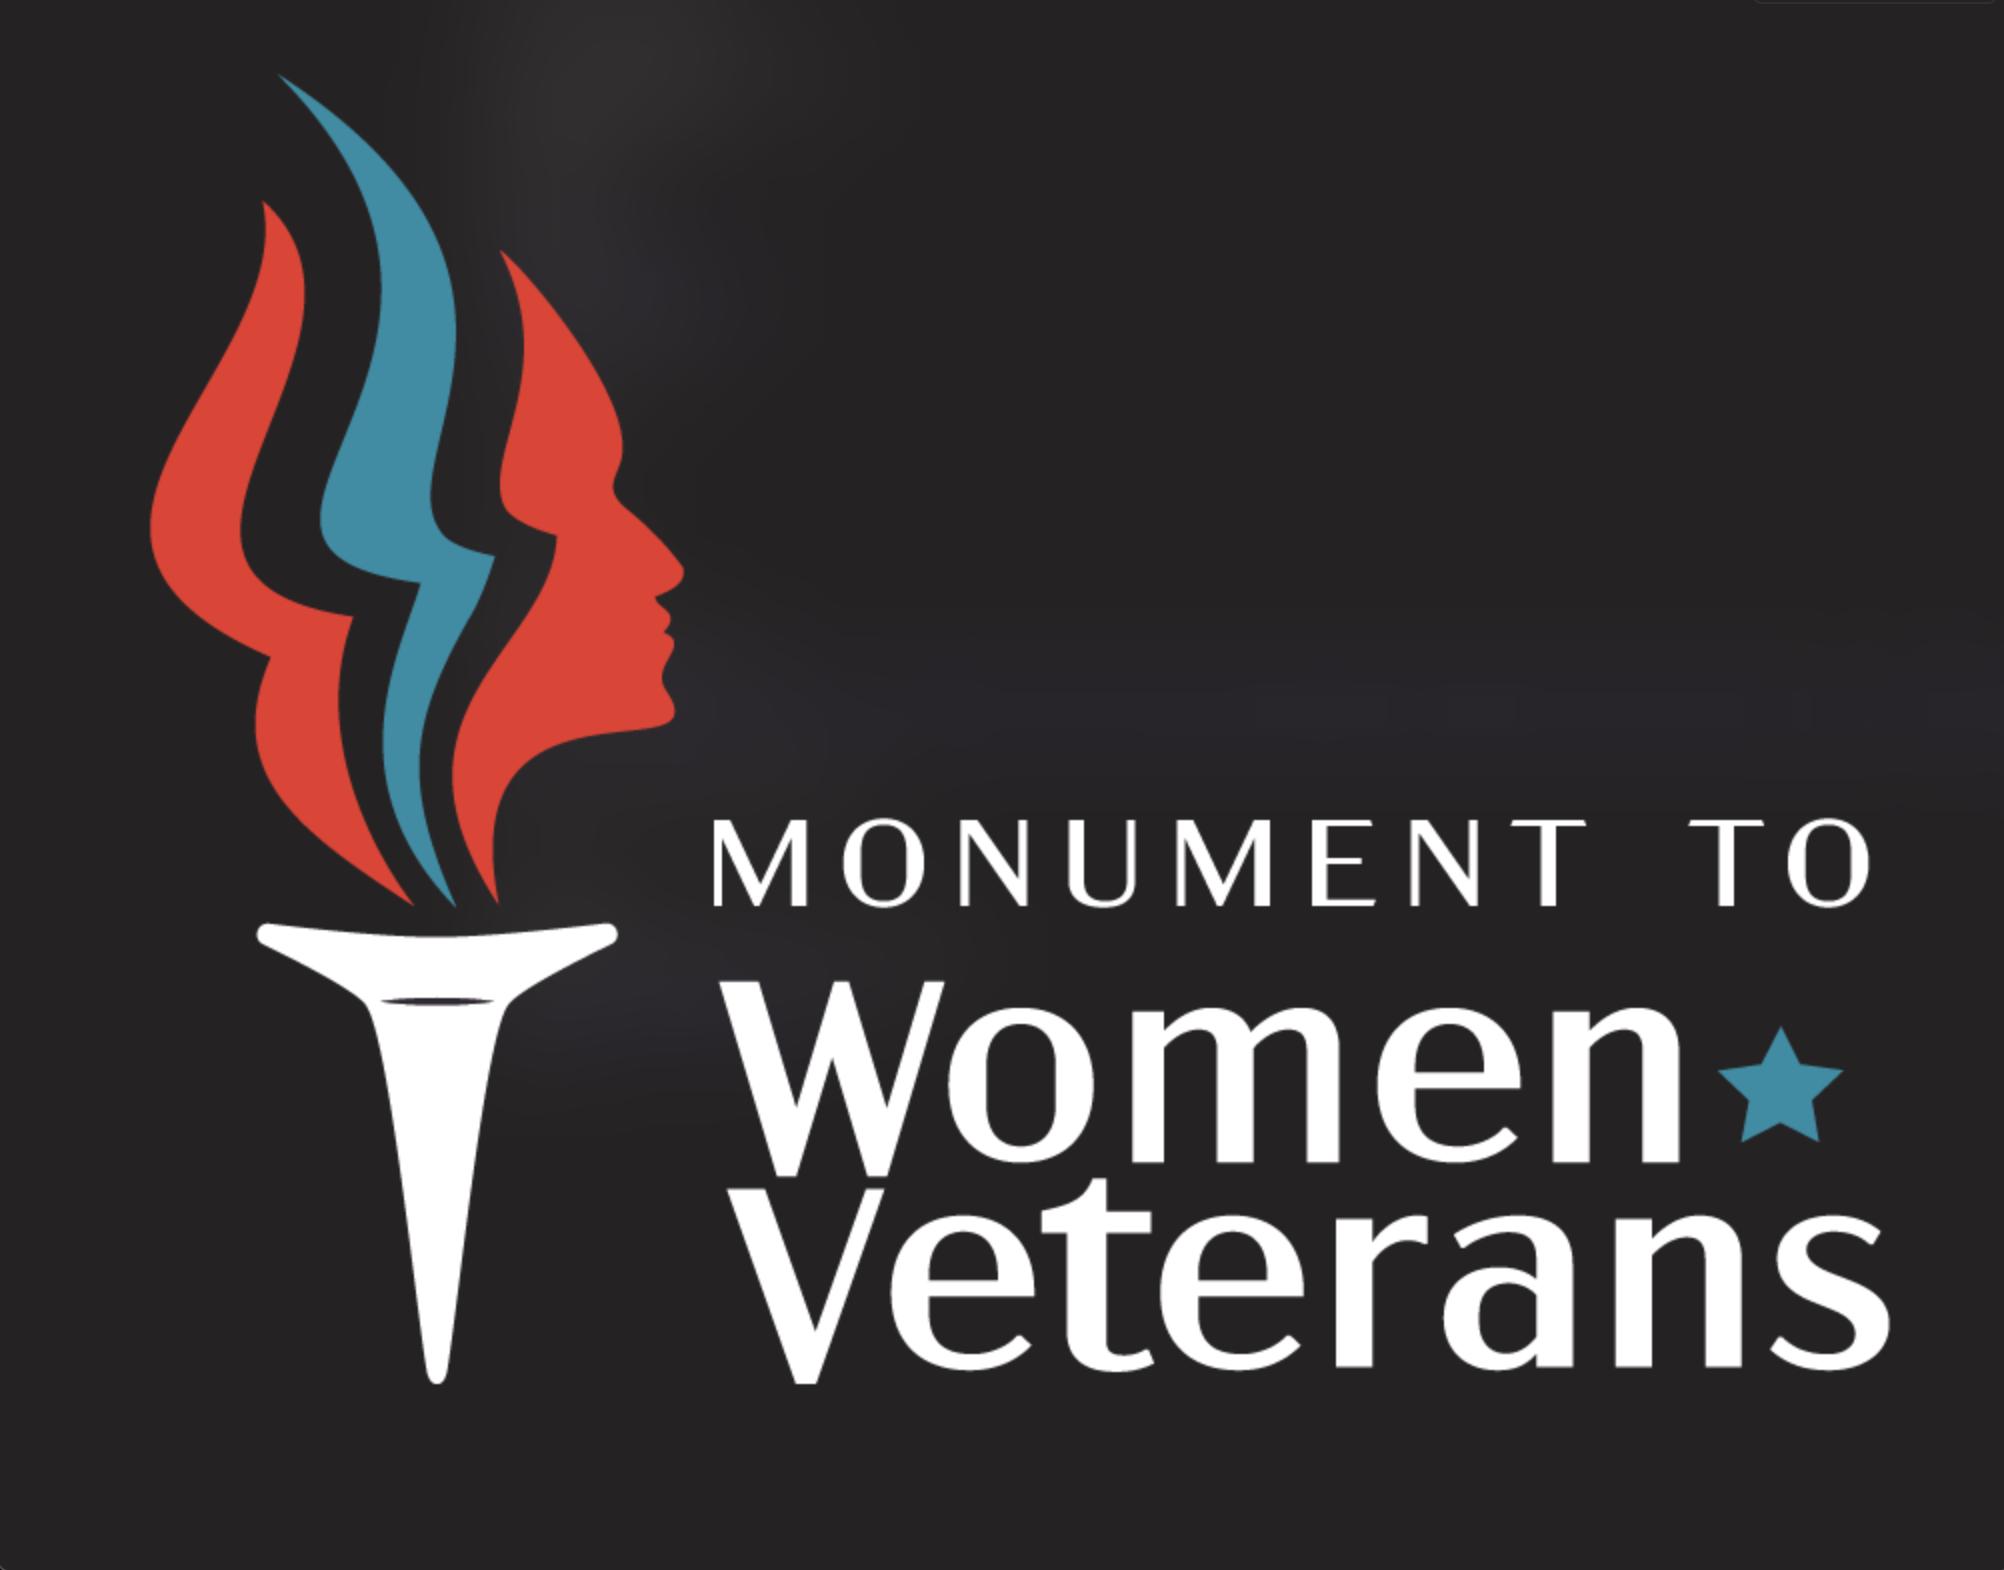 Monument to Women Veterans